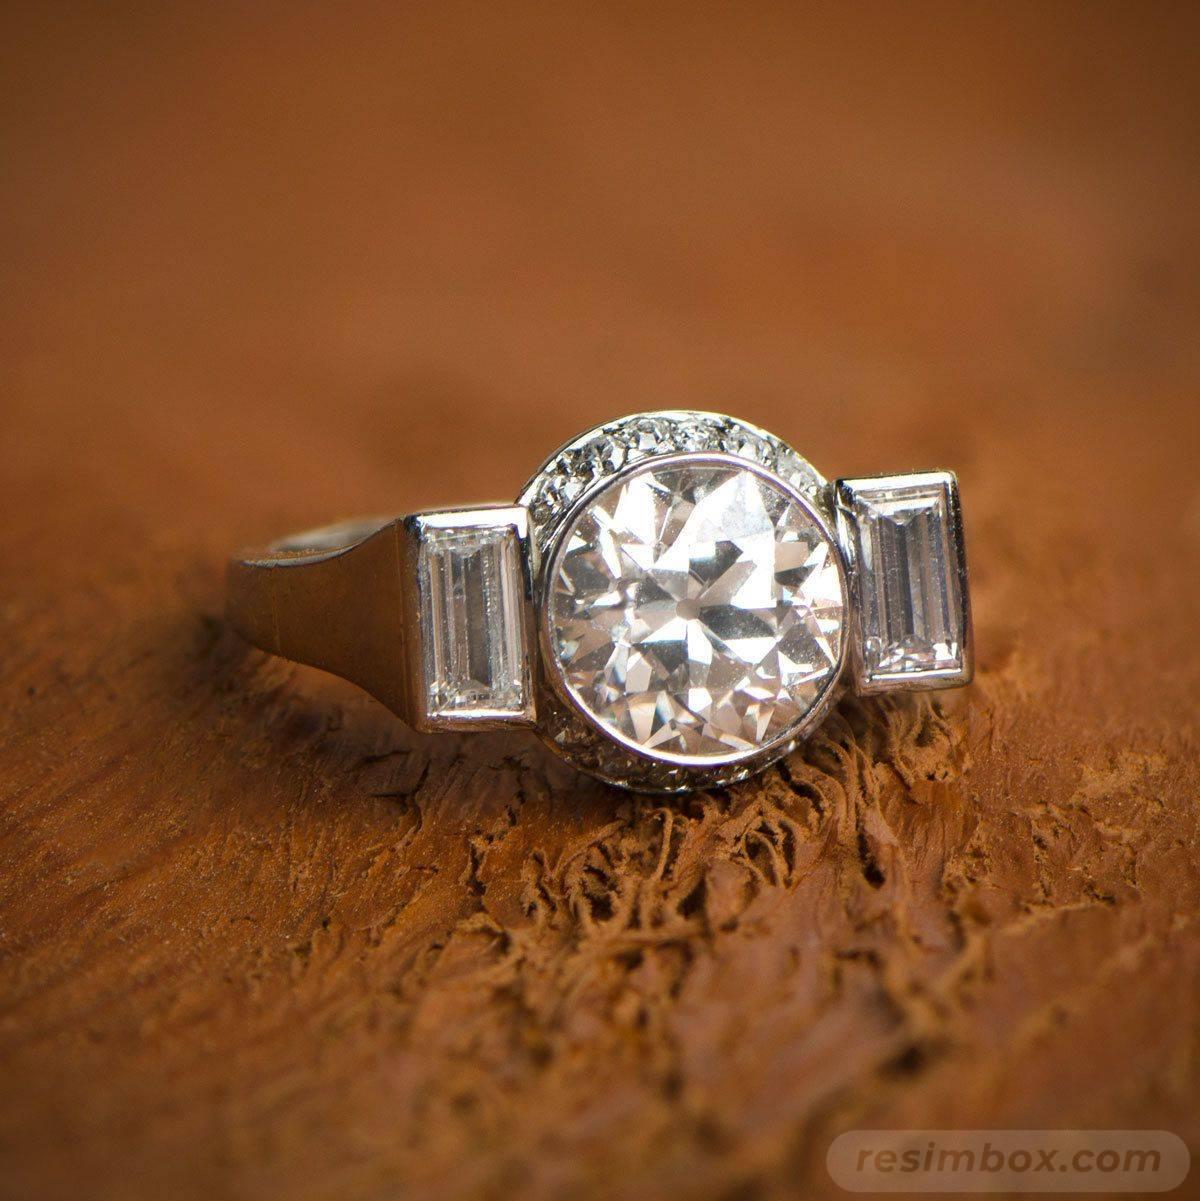 Art deco jewelry-16044142403789948